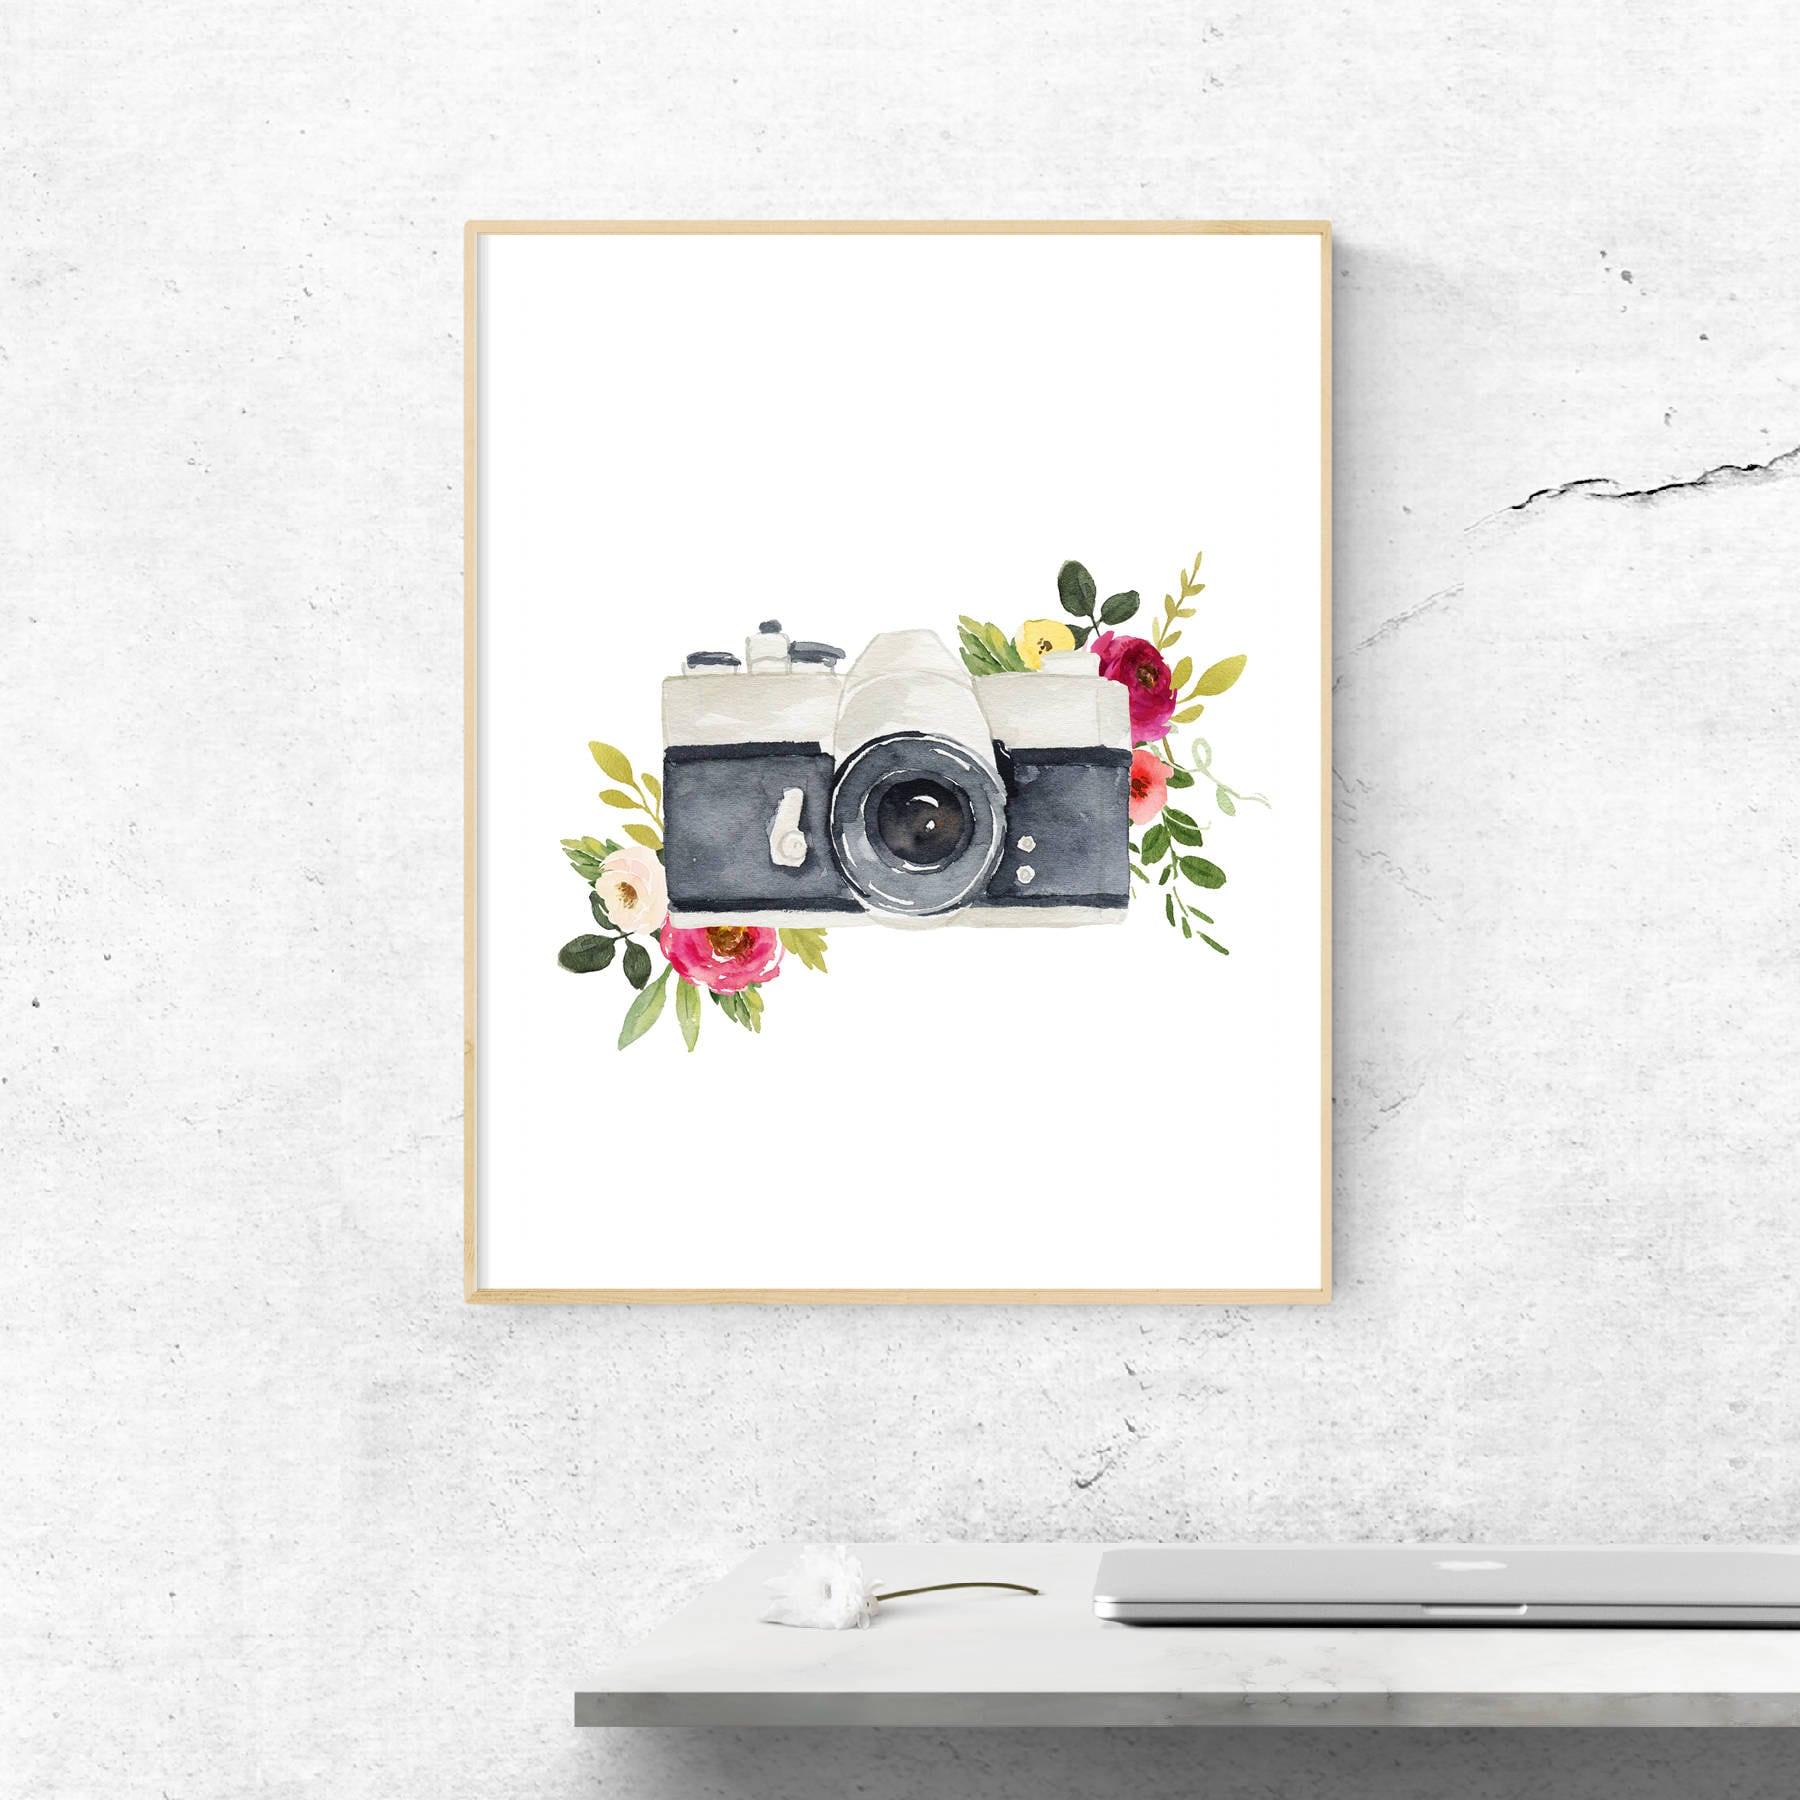 image relating to Printable Camera titled Watercolor digicam flower printable, floral printable, digital camera printable, floral decor, Residence Decor, Wall Decor, purple decor, nursery decor